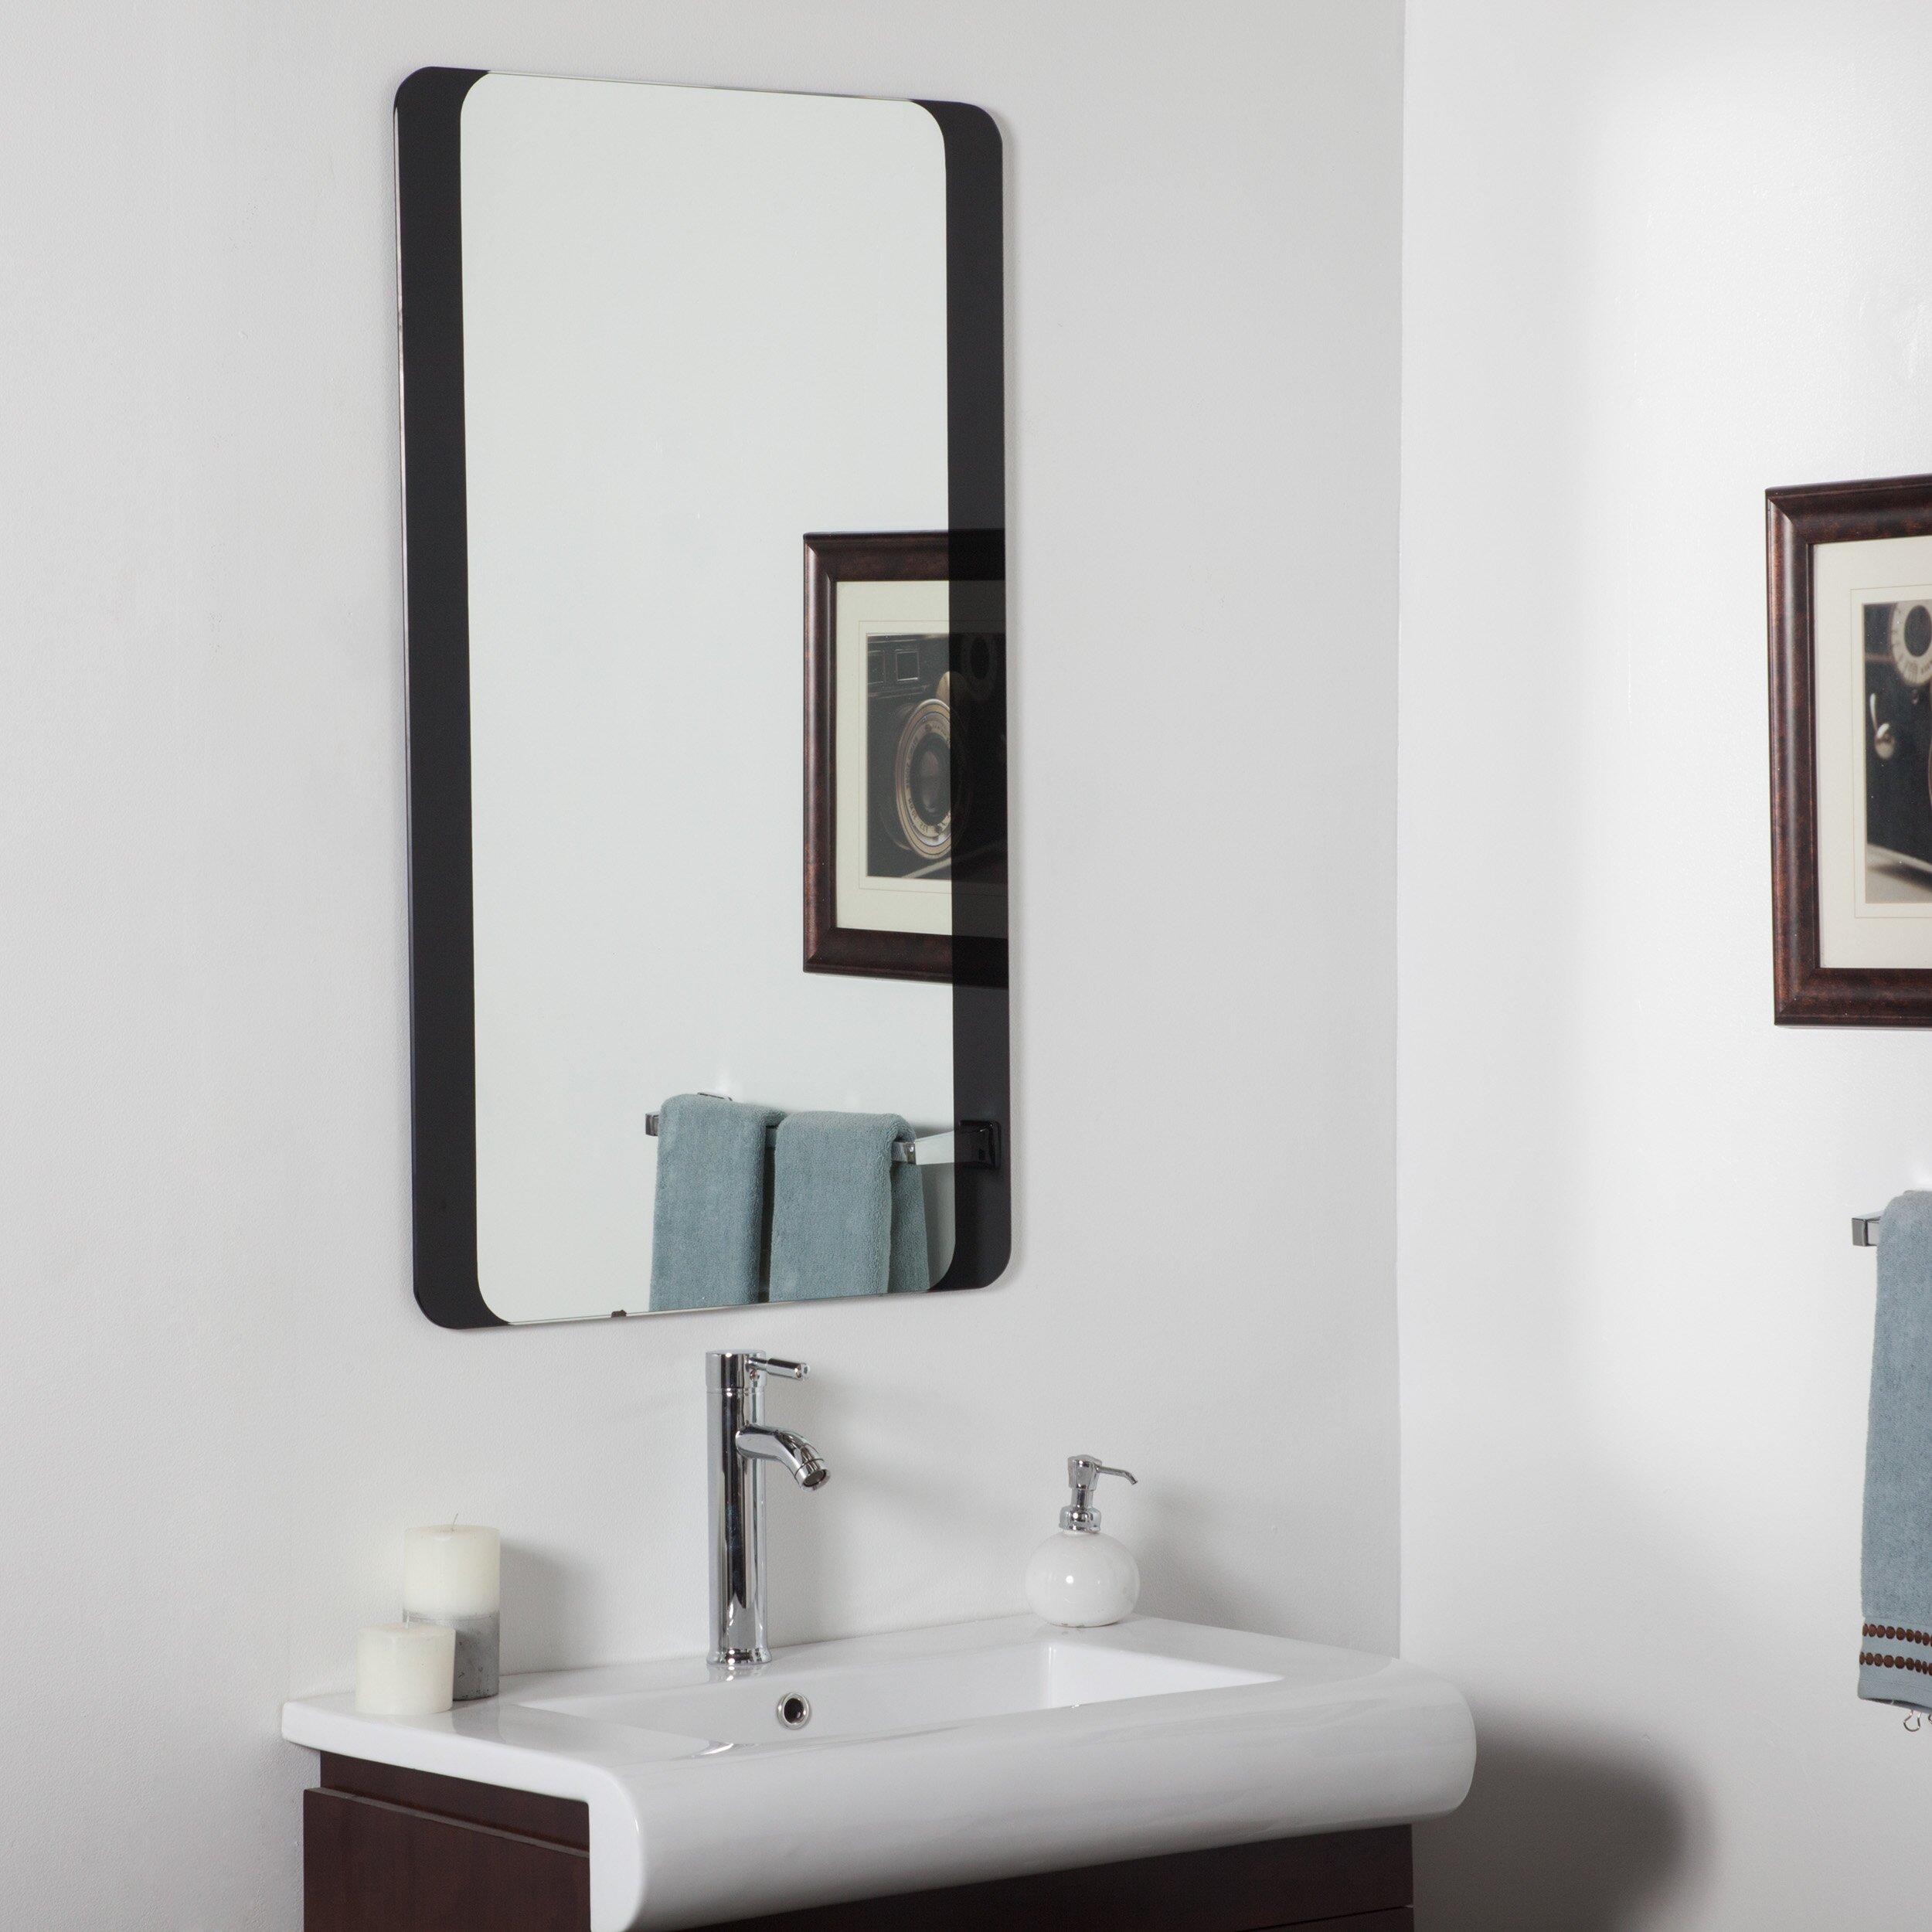 Decor Wonderland Large Wall Mirror & Reviews | Wayfair